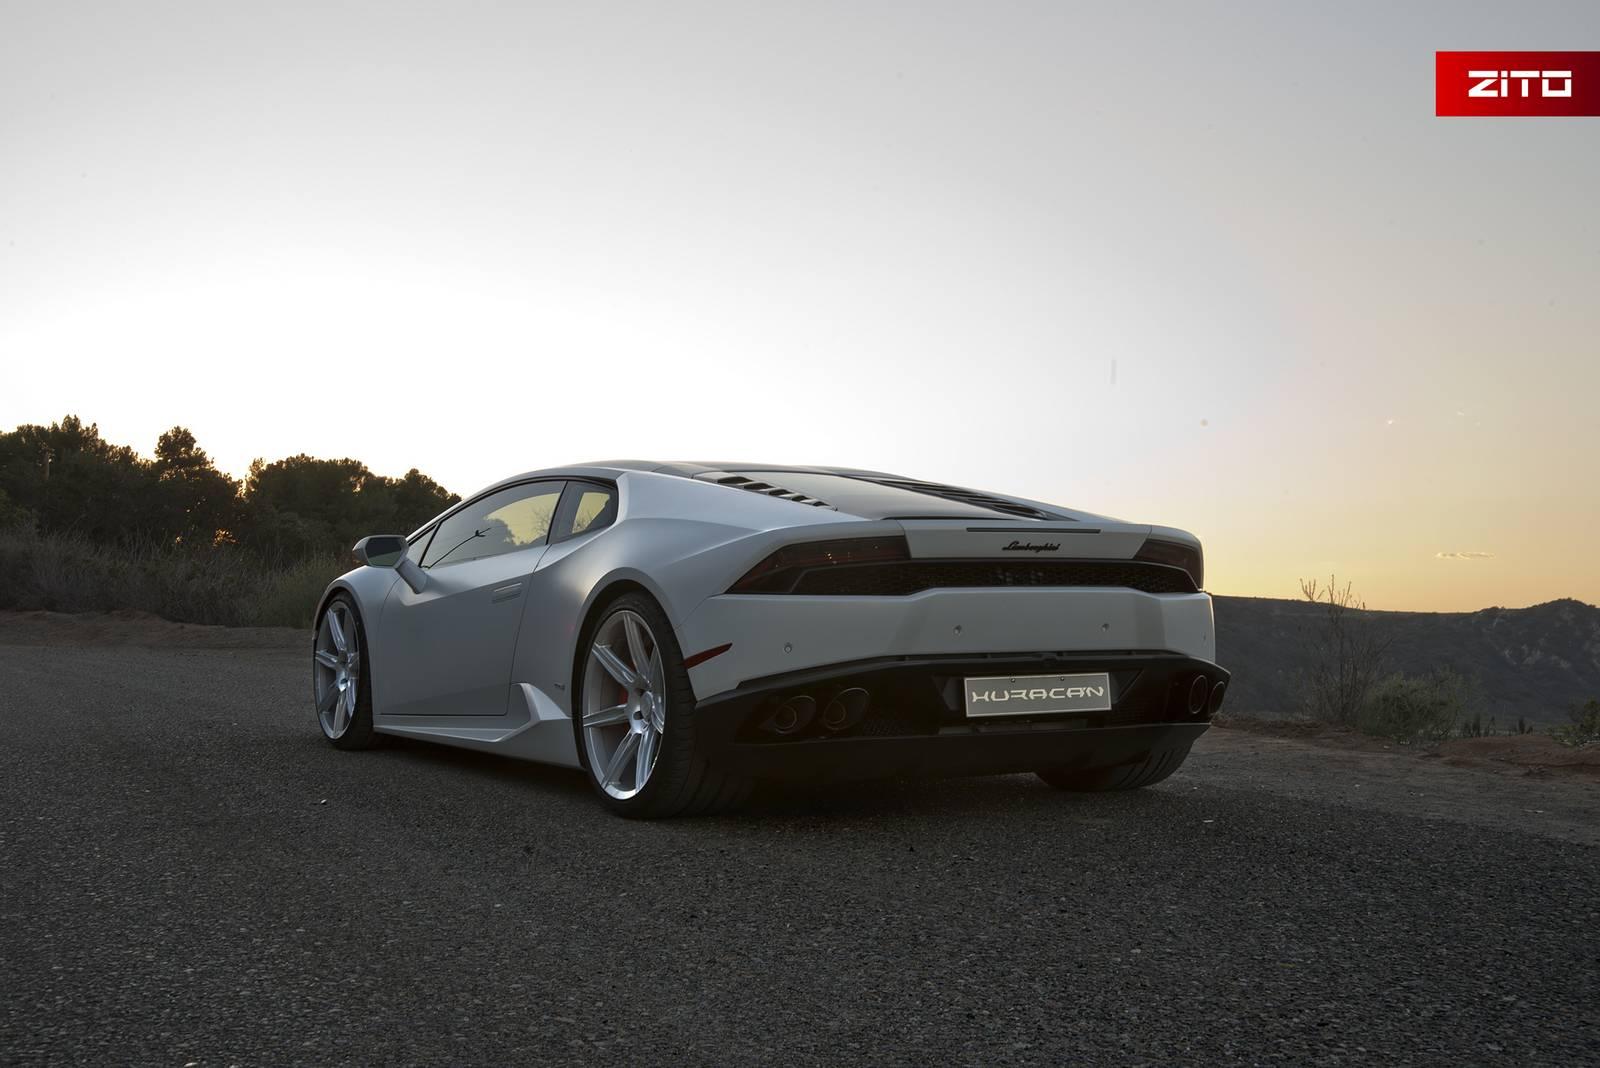 Bianco Novus Lamborghini Huracan with Anodized Silver Zito ...